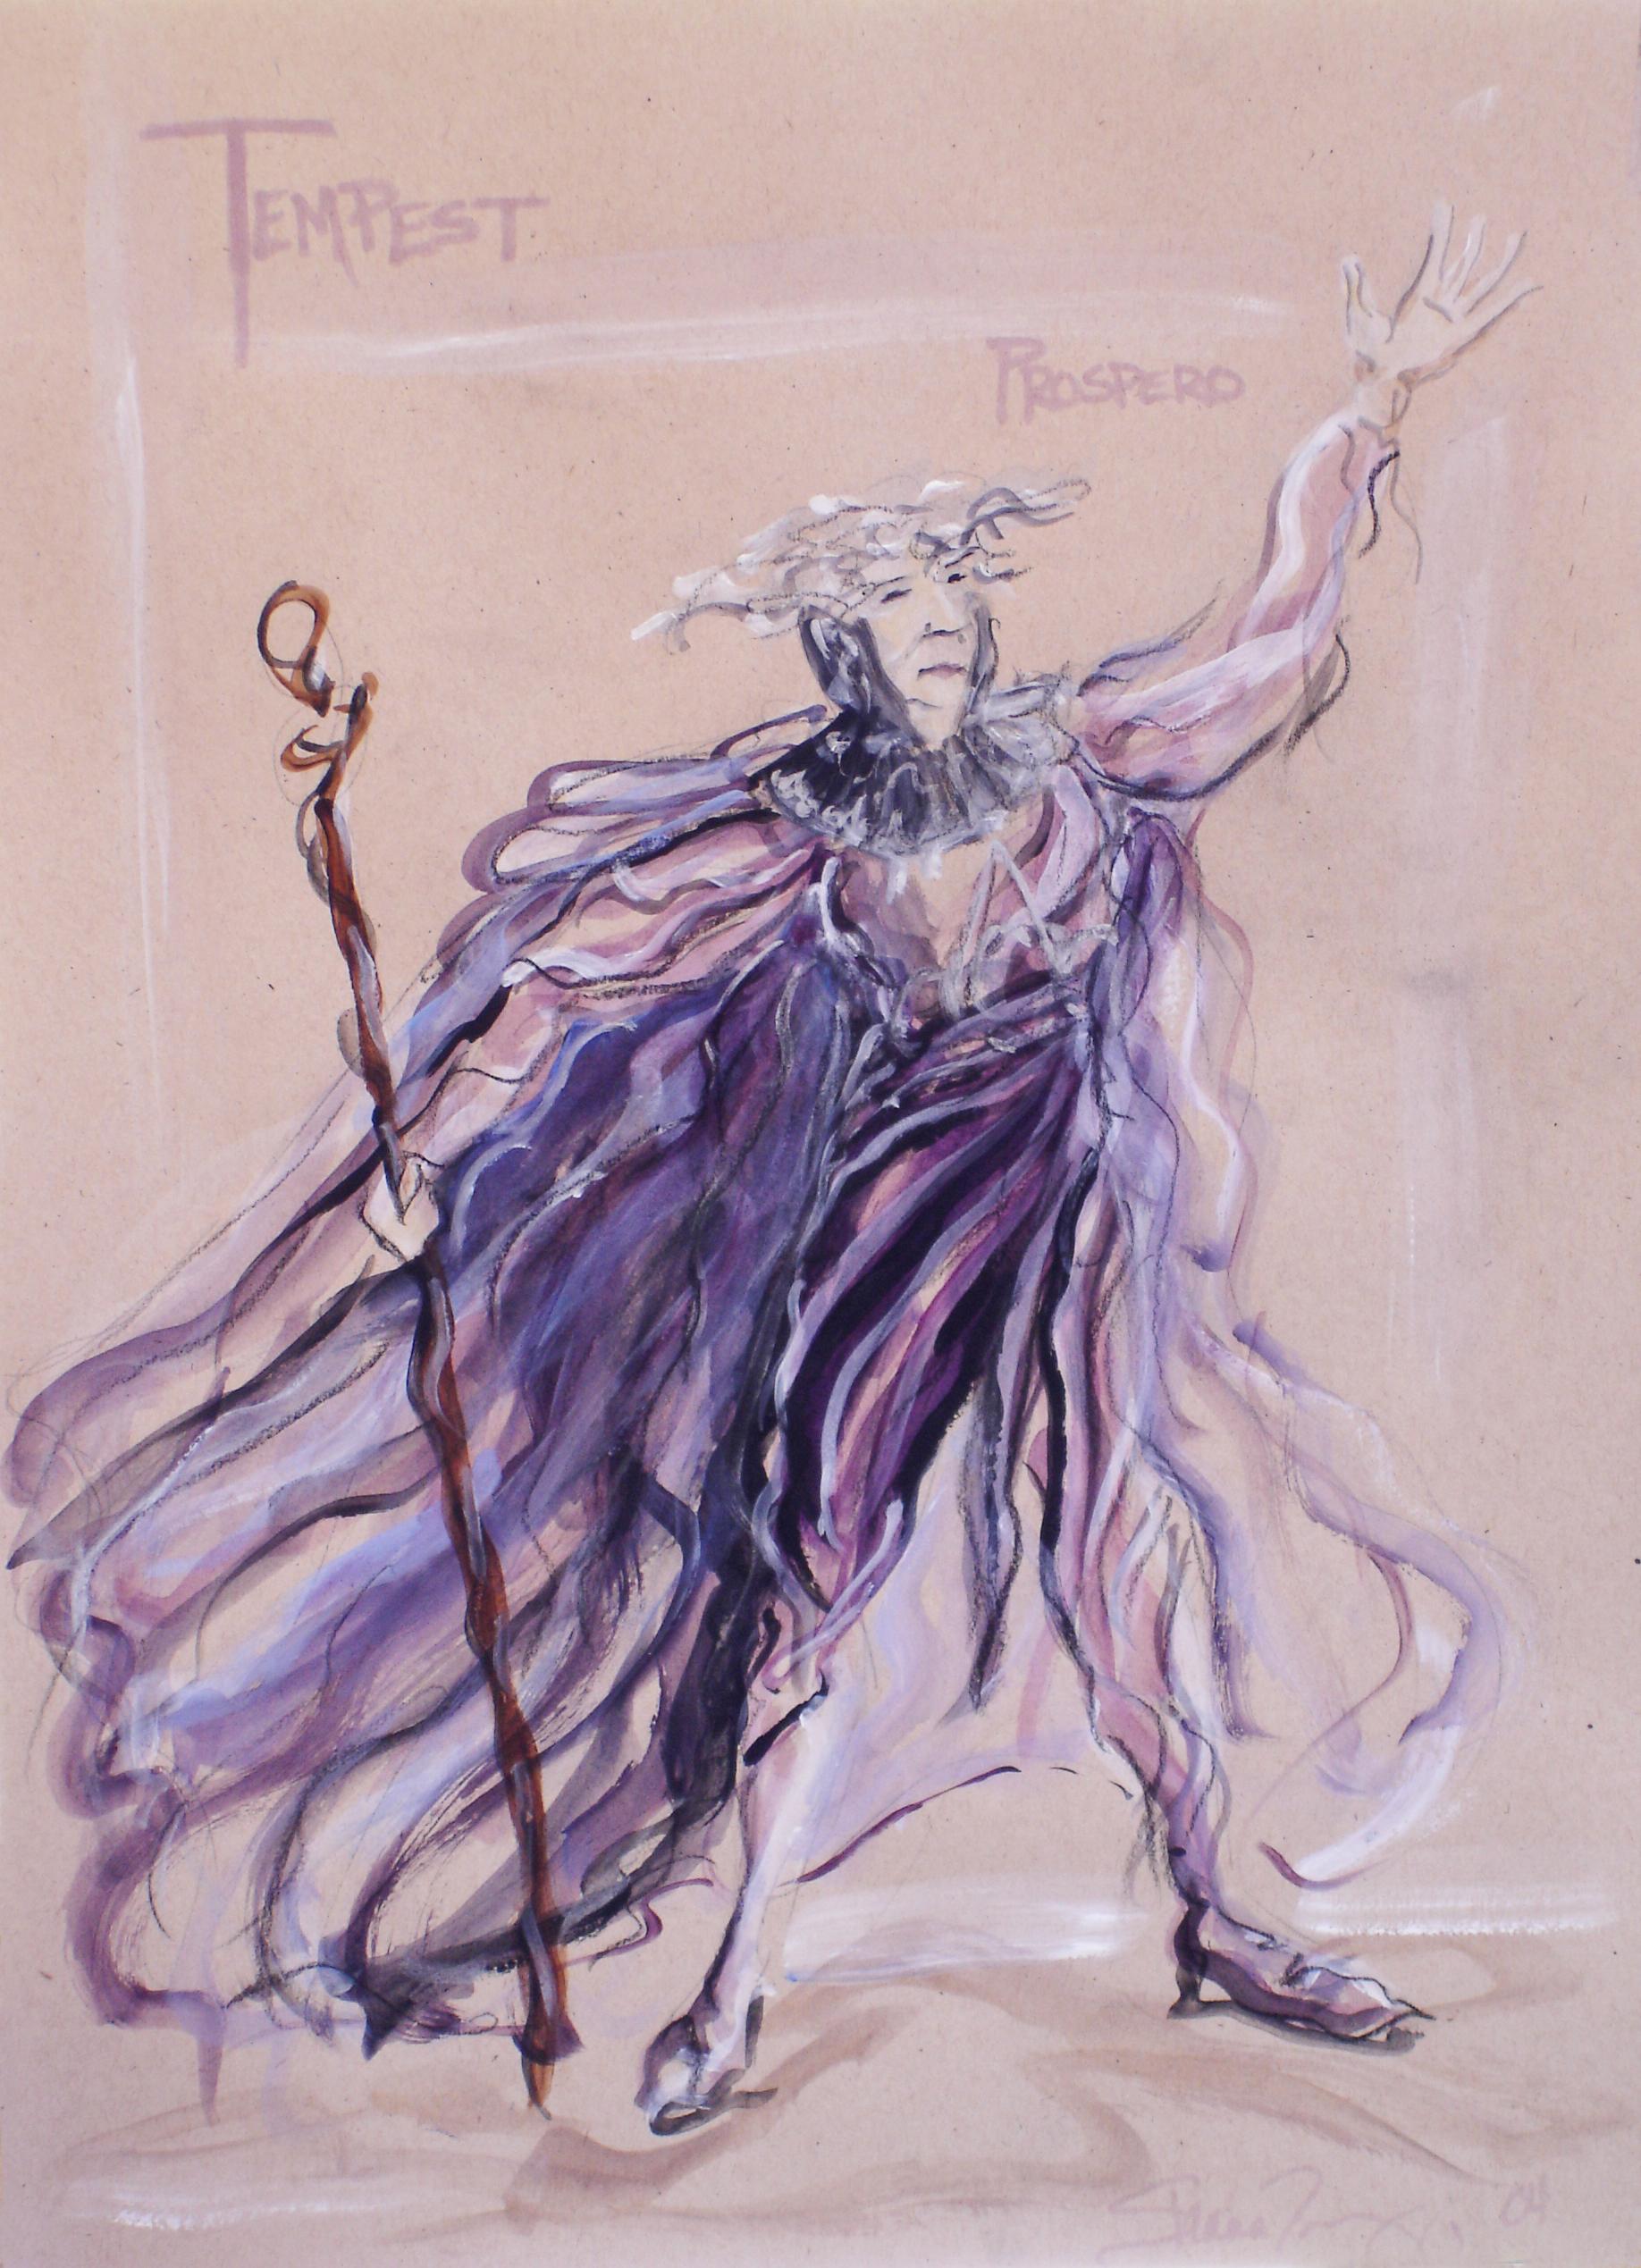 Concept Rendering - Prospero, The Tempest